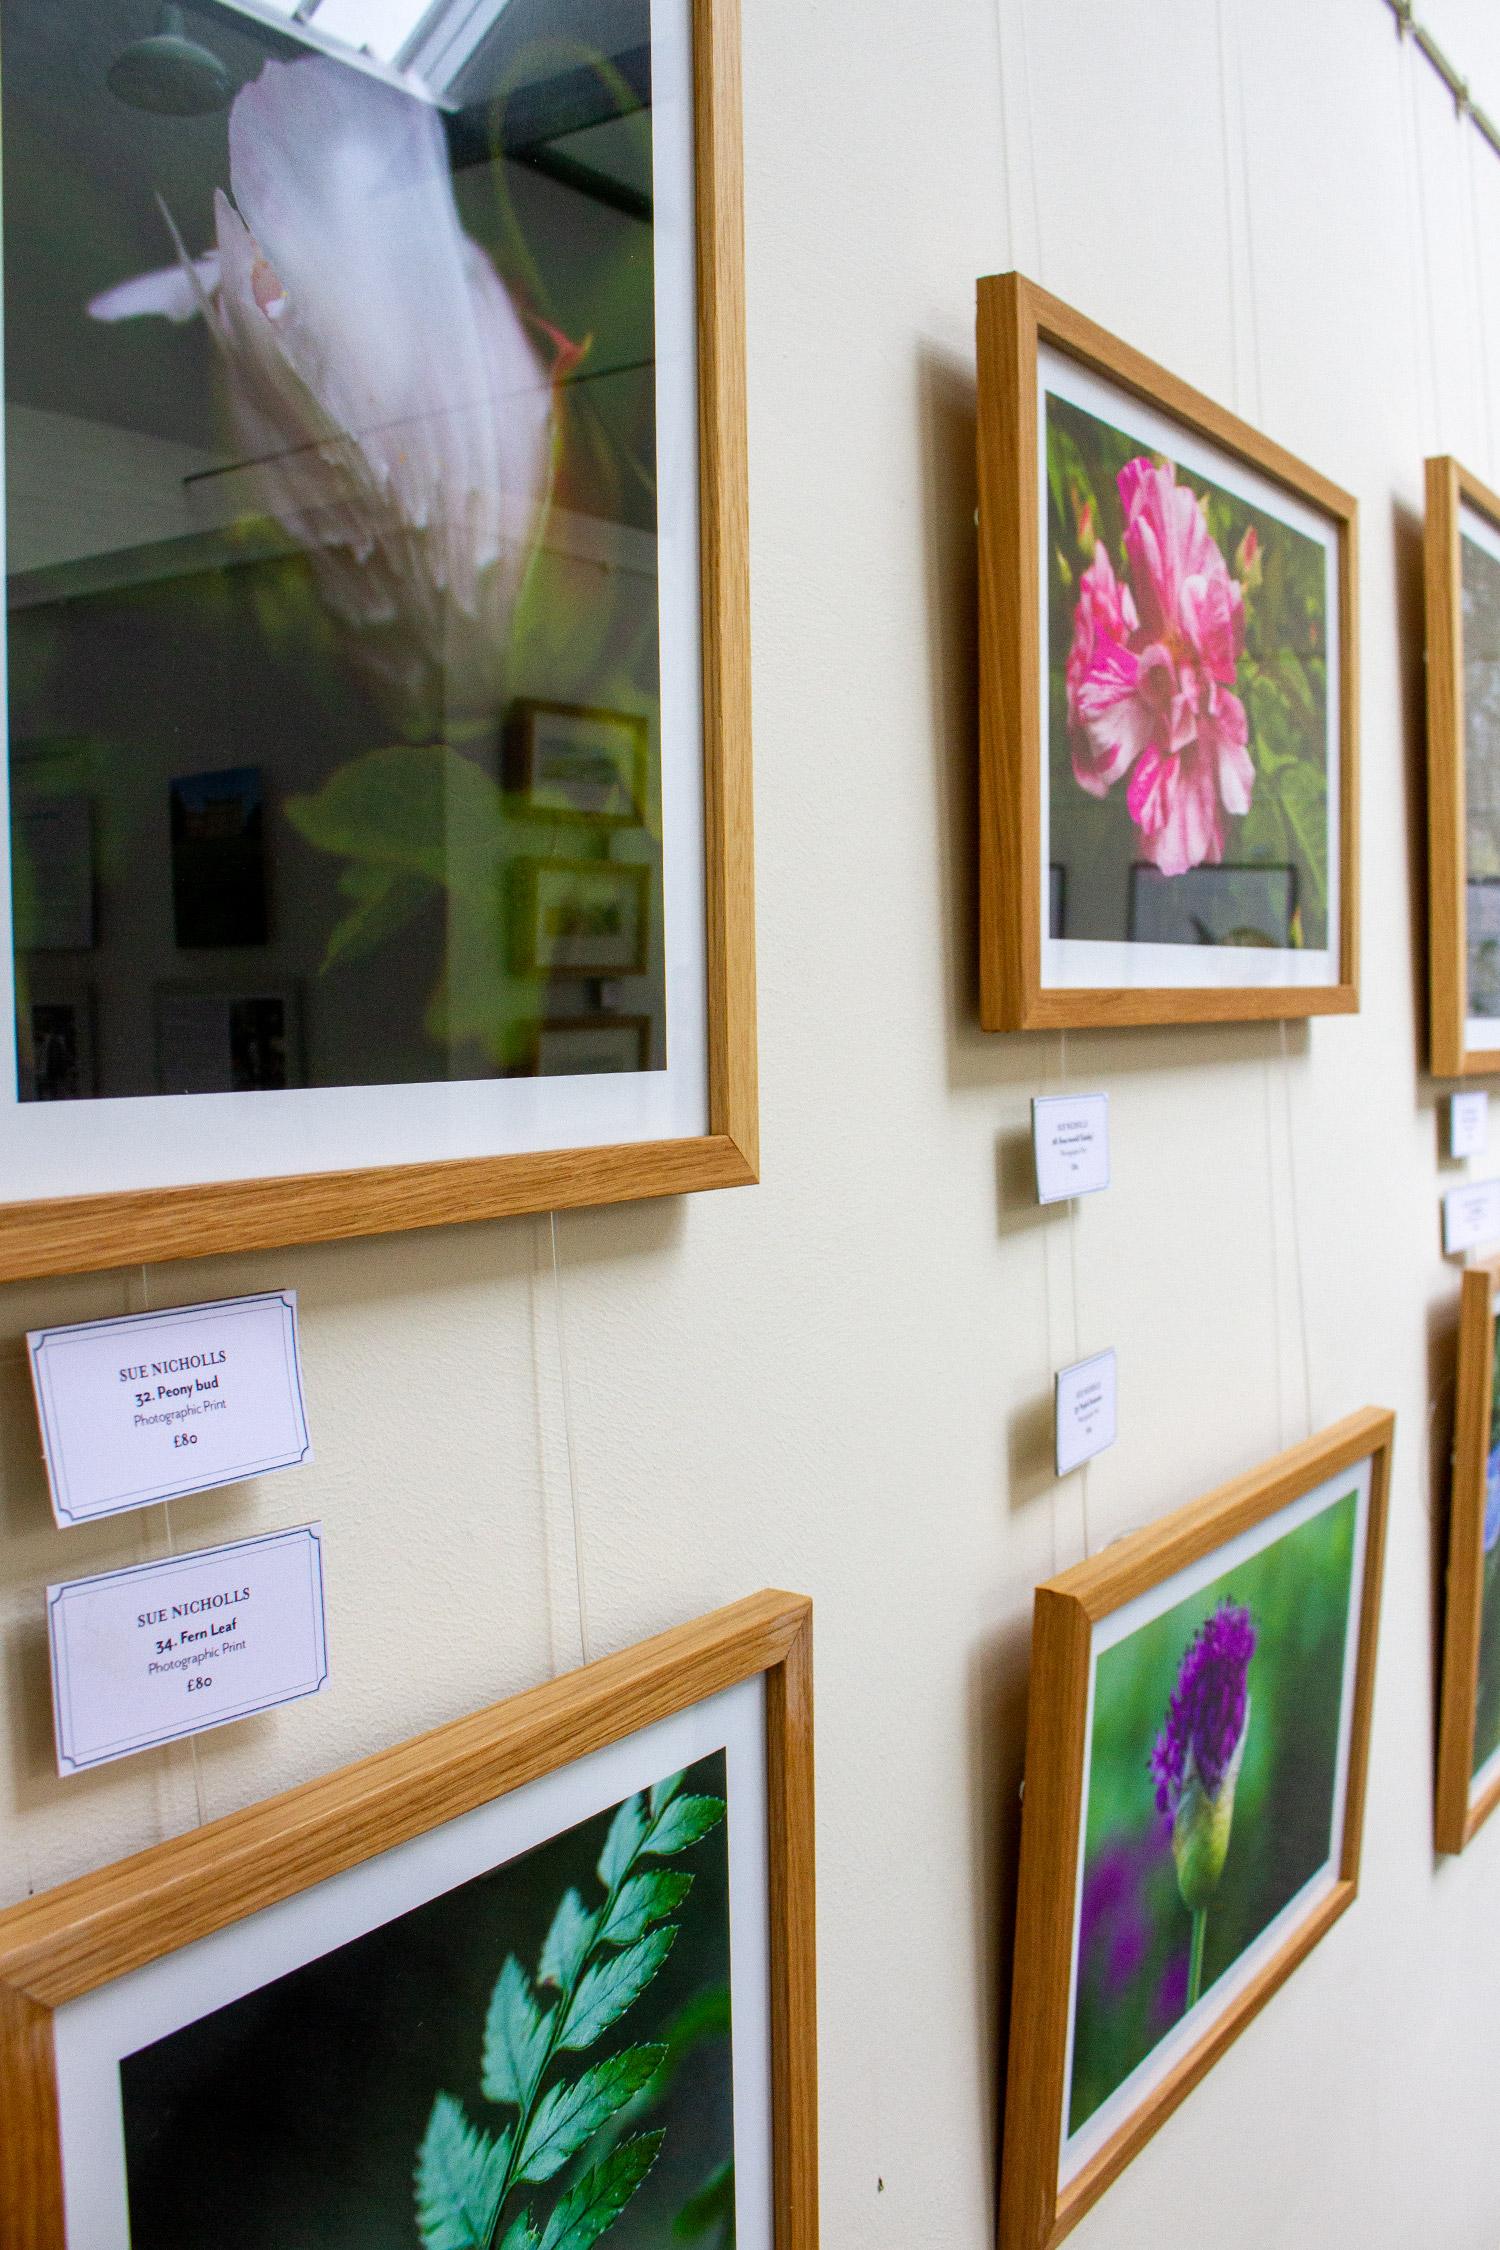 Sue Nicholls Photographic Prints